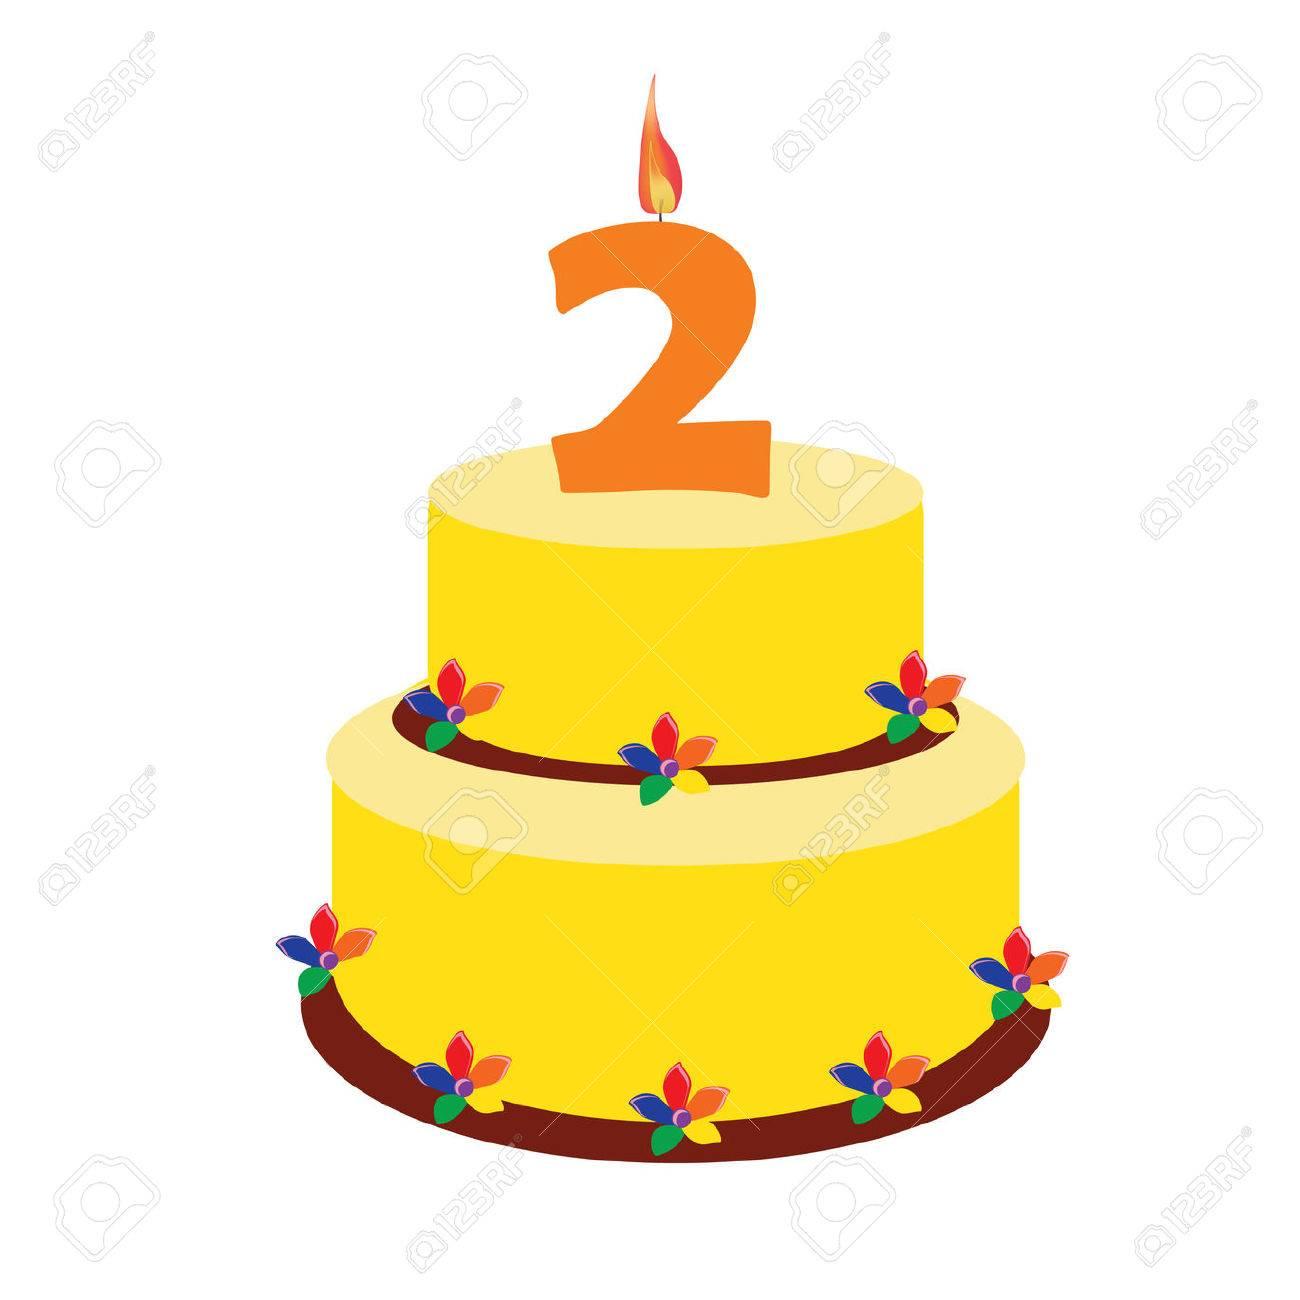 Fabulous Birthday Cake Two Years Second Birthday Raster Birthday Cake Funny Birthday Cards Online Fluifree Goldxyz